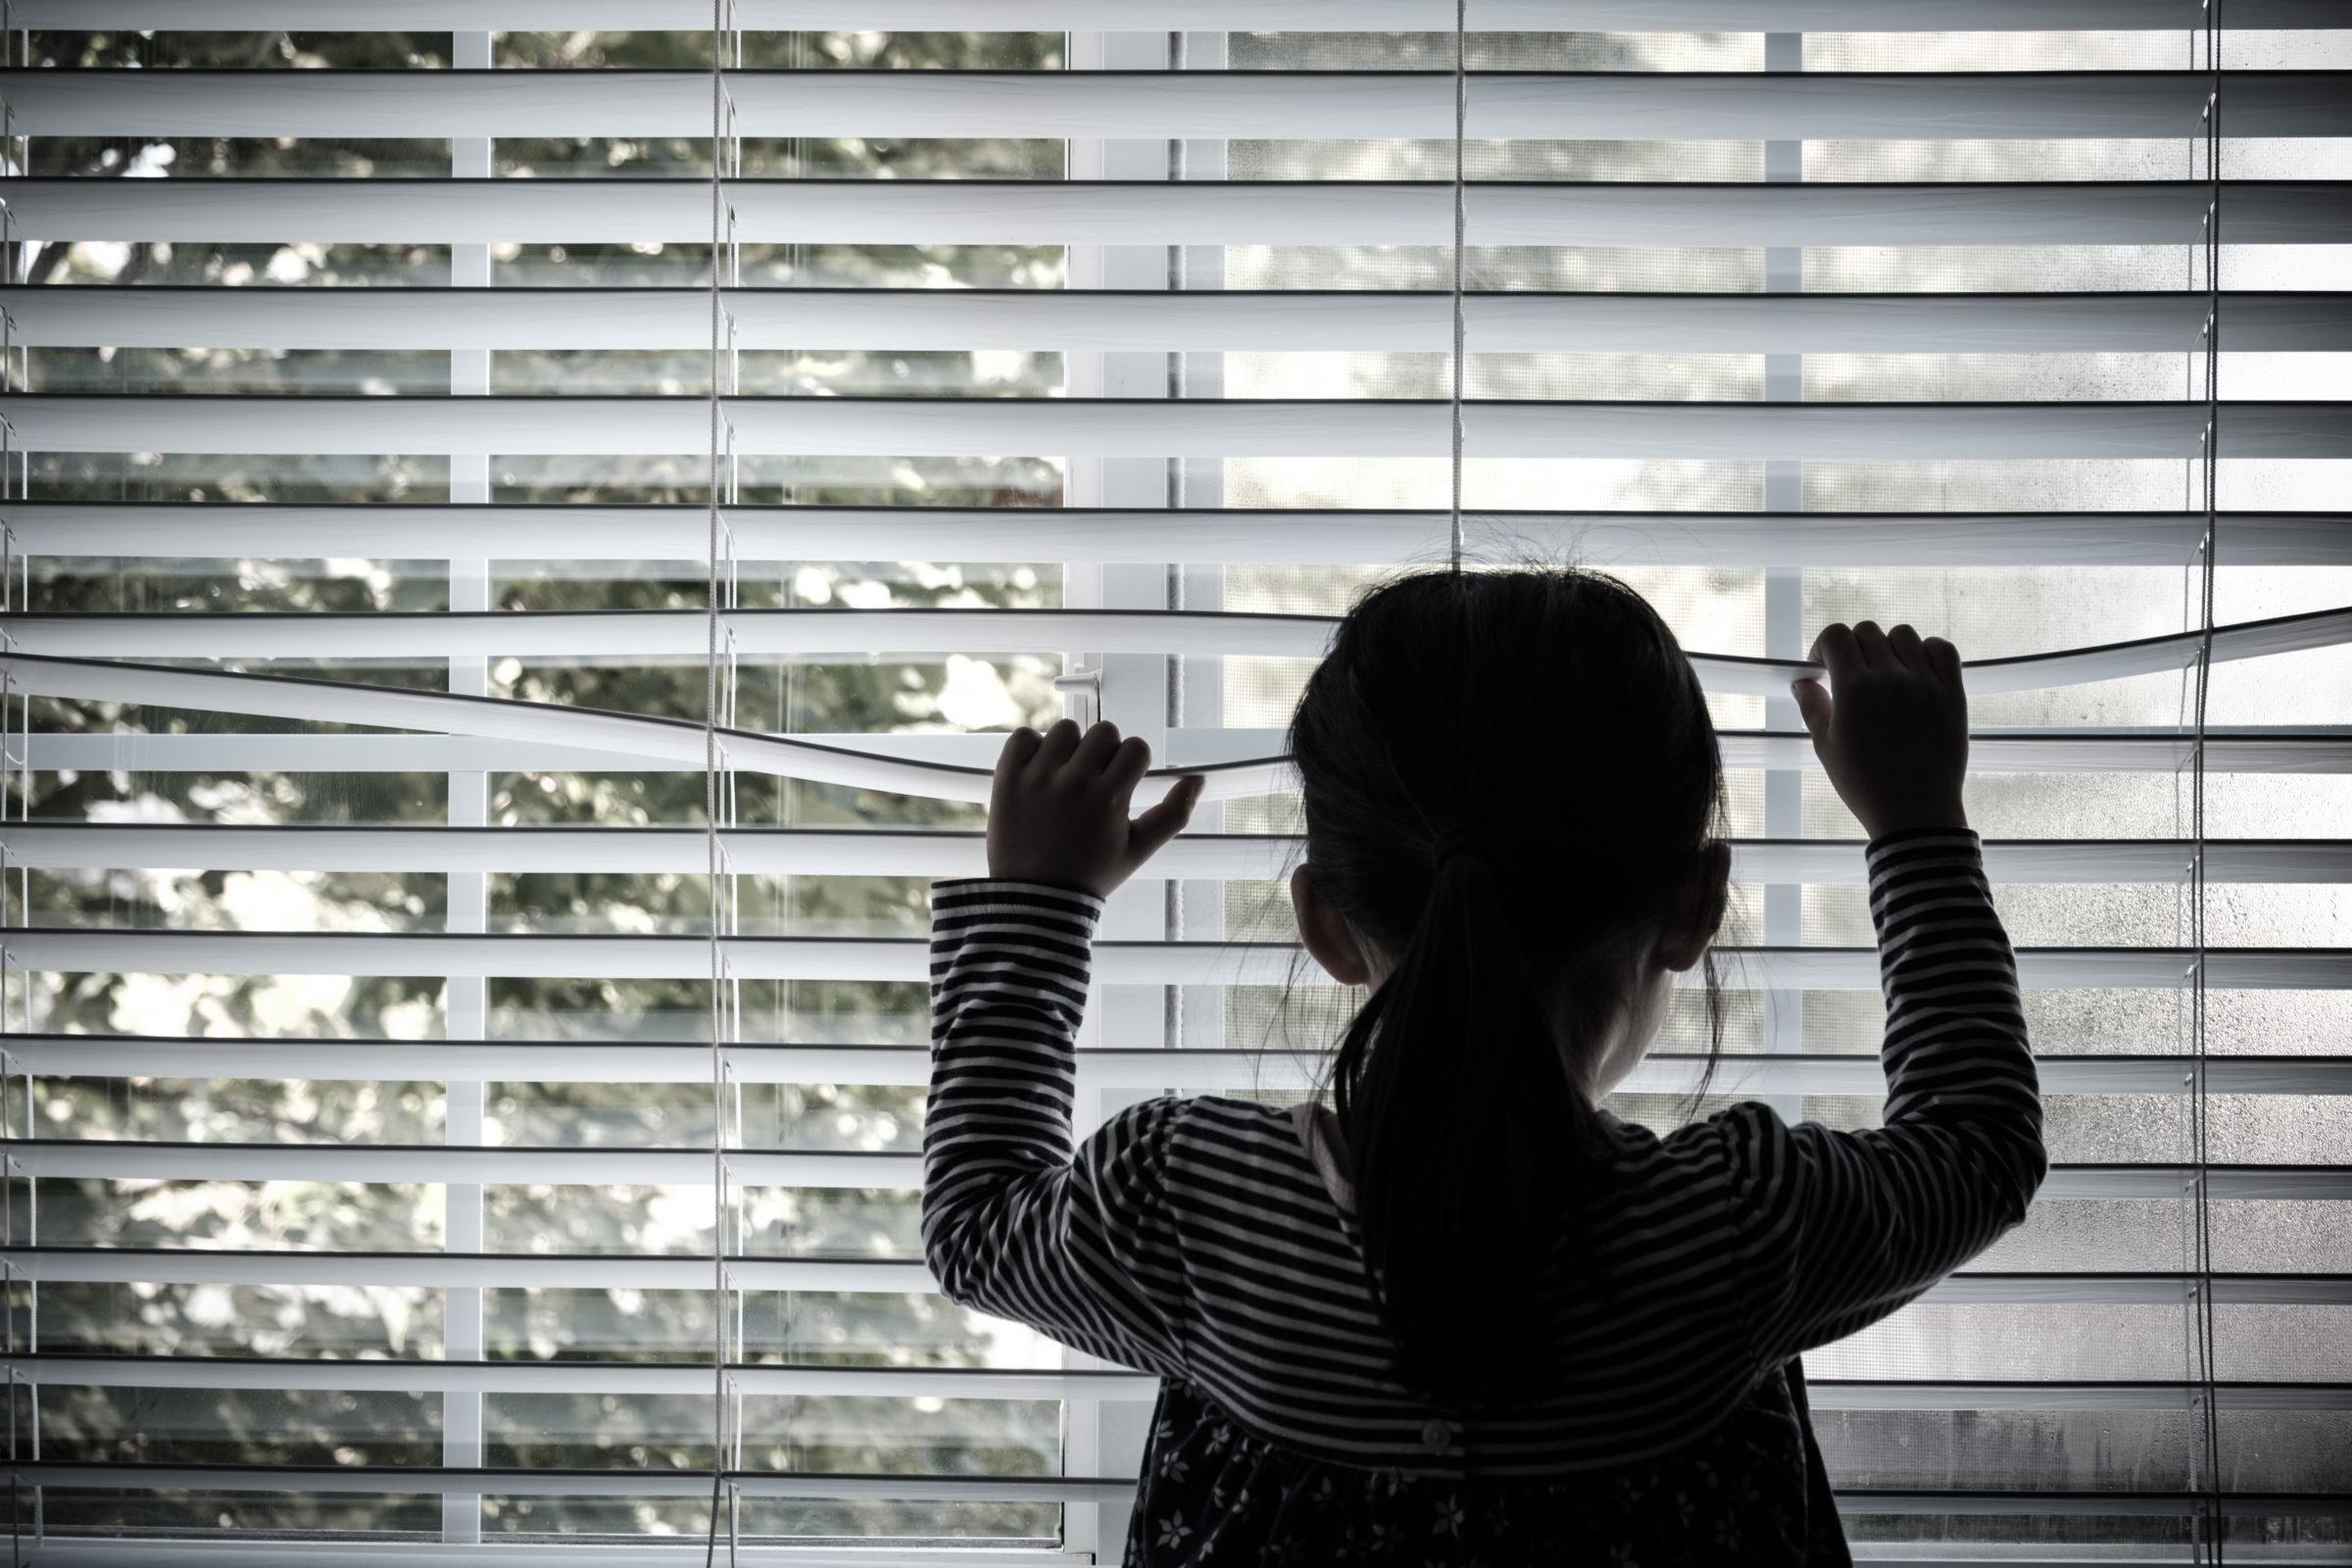 lonely little kid in front of a window 5NT8QZE